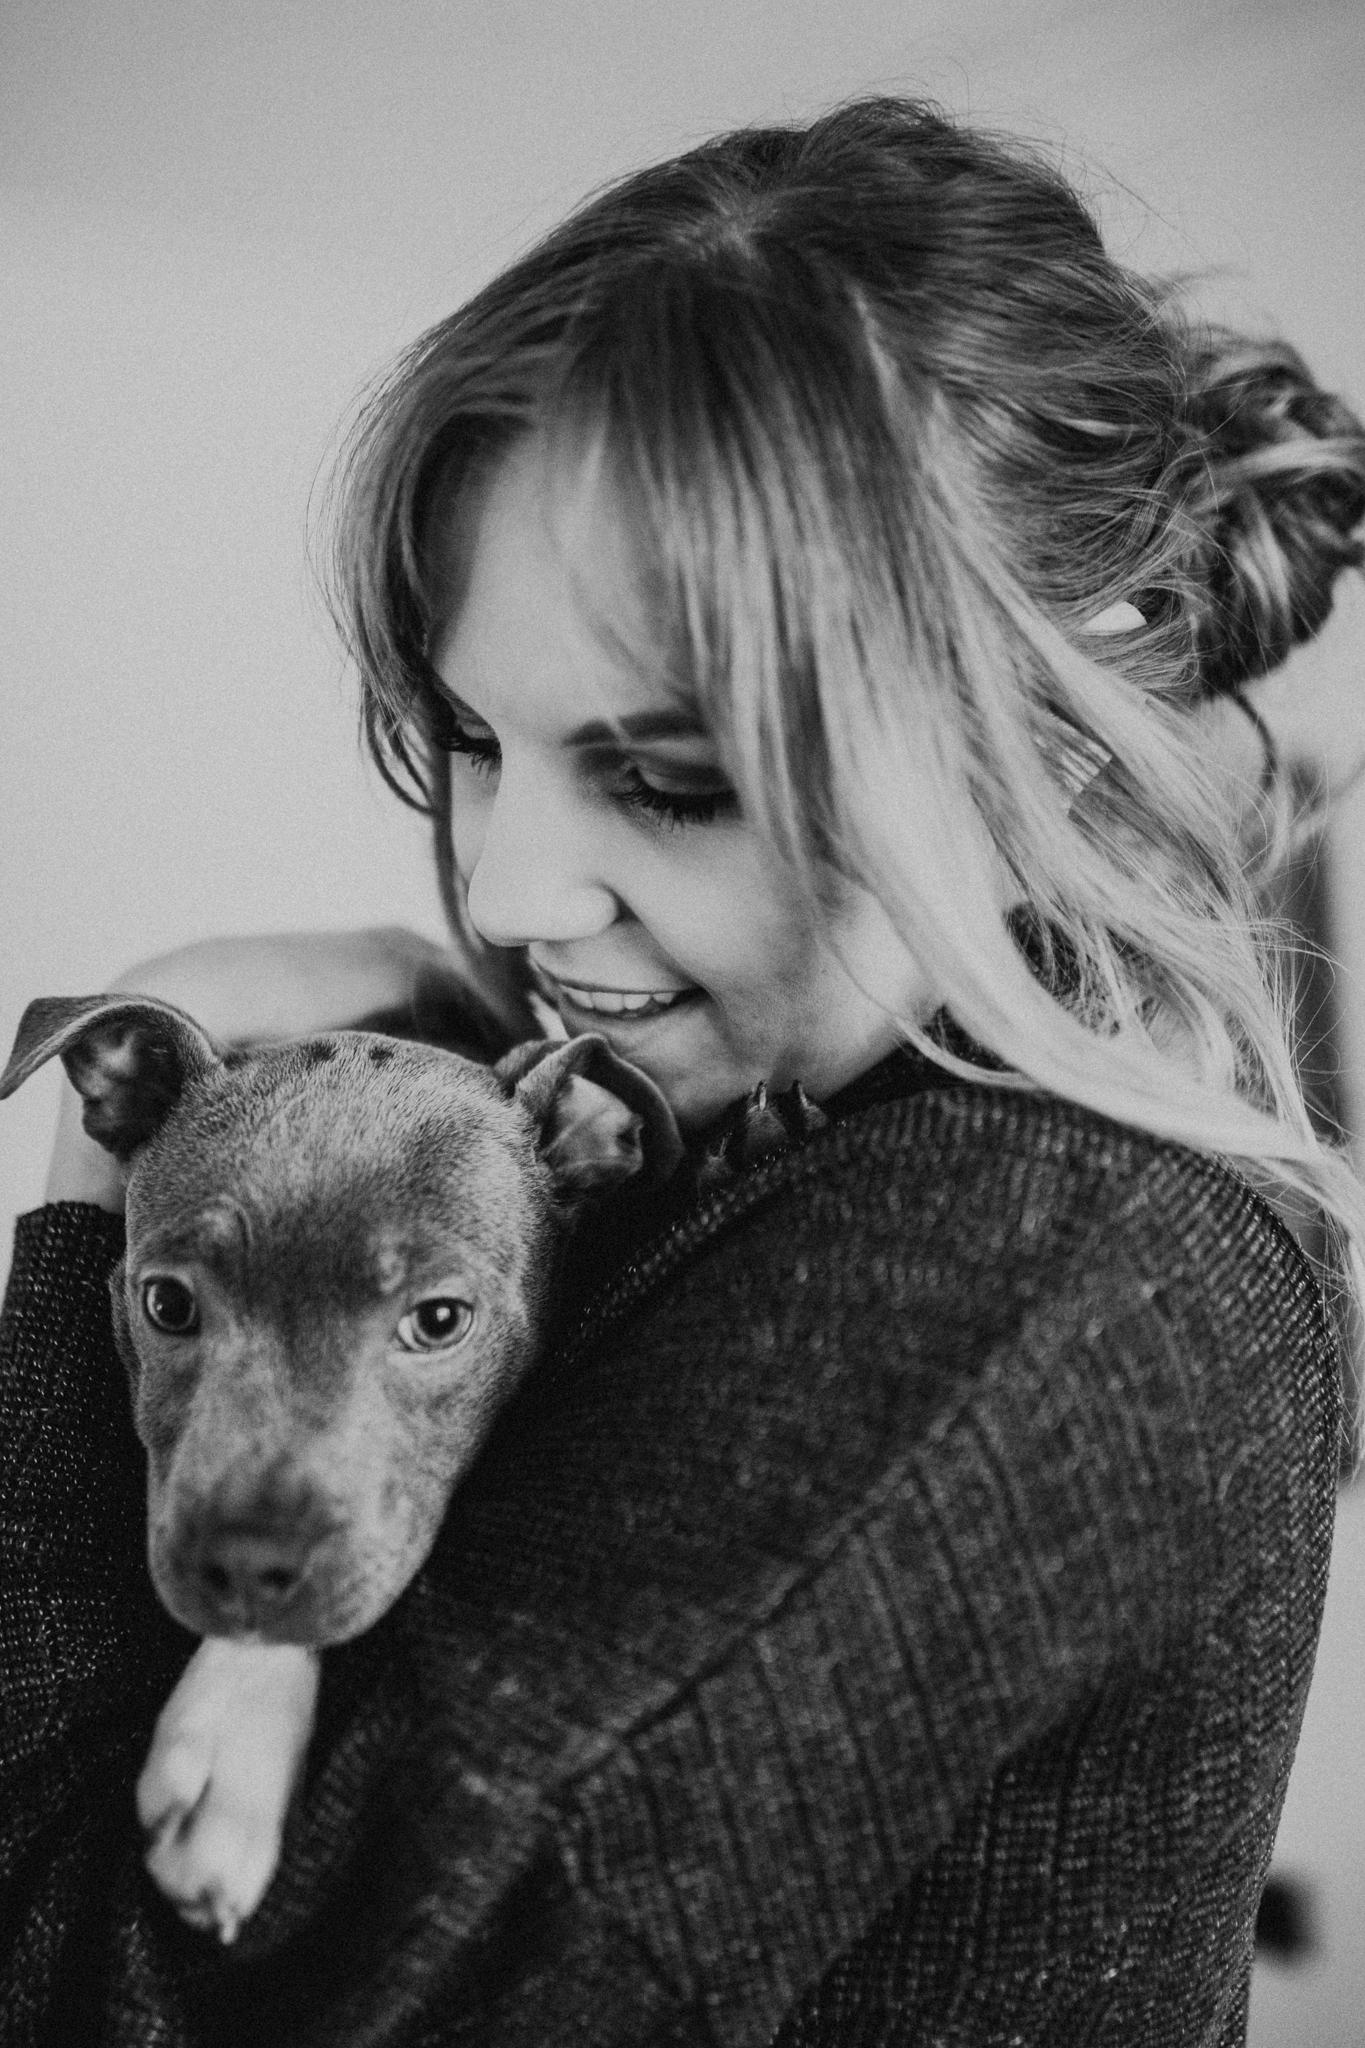 Dog-Human-Session-Photography-Darina-Stoda-Animal-Indigo-16.jpg